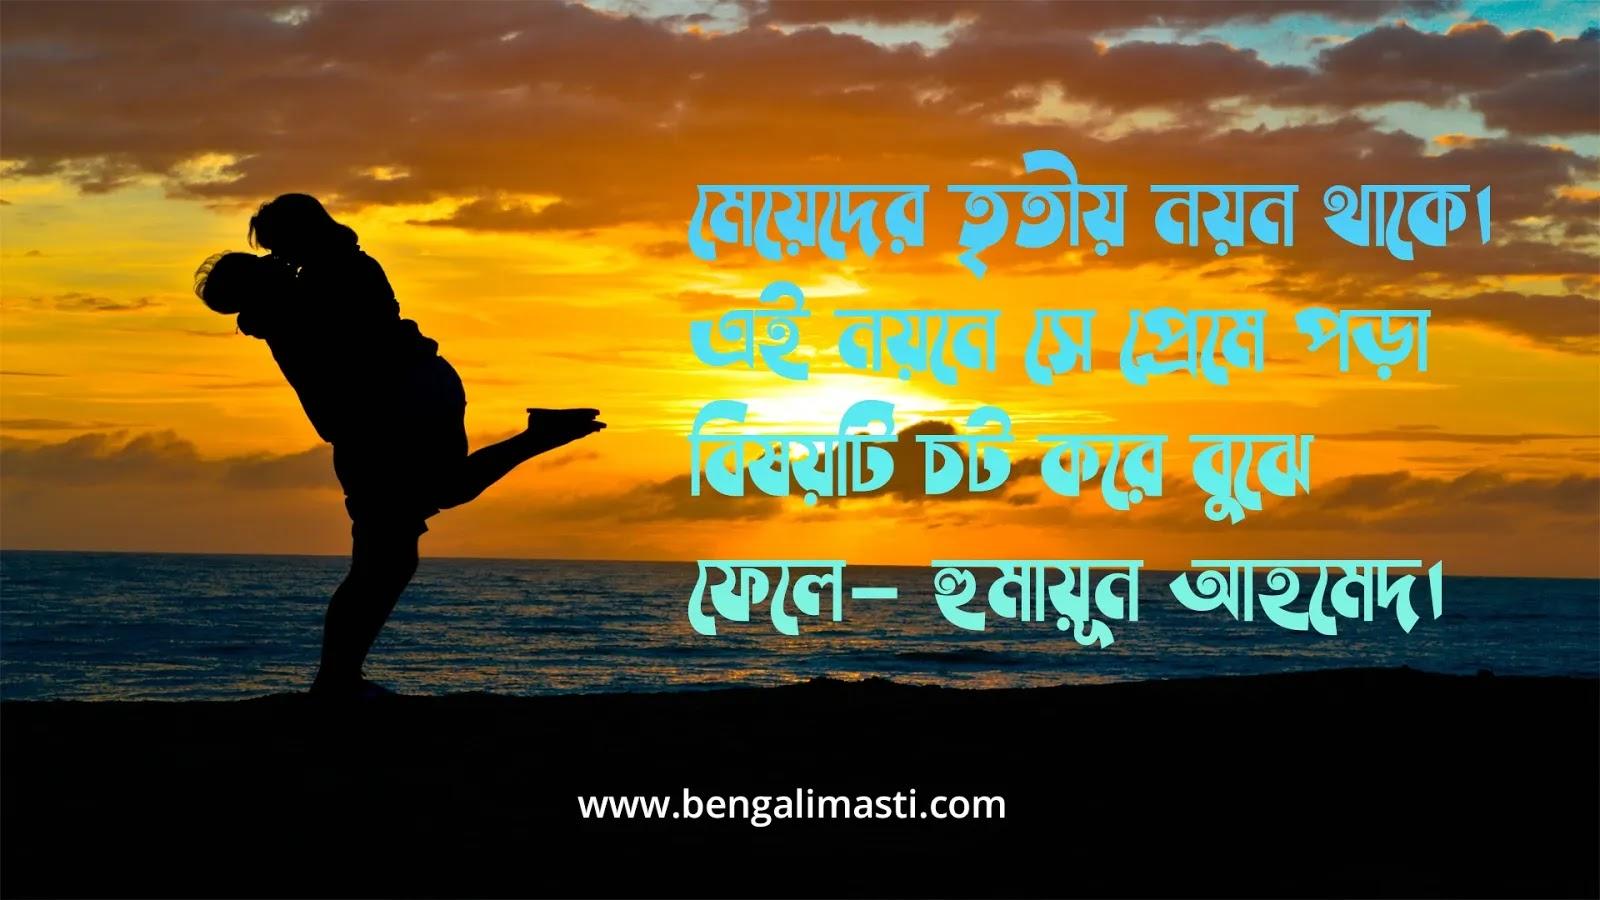 bengali sad quotes about love